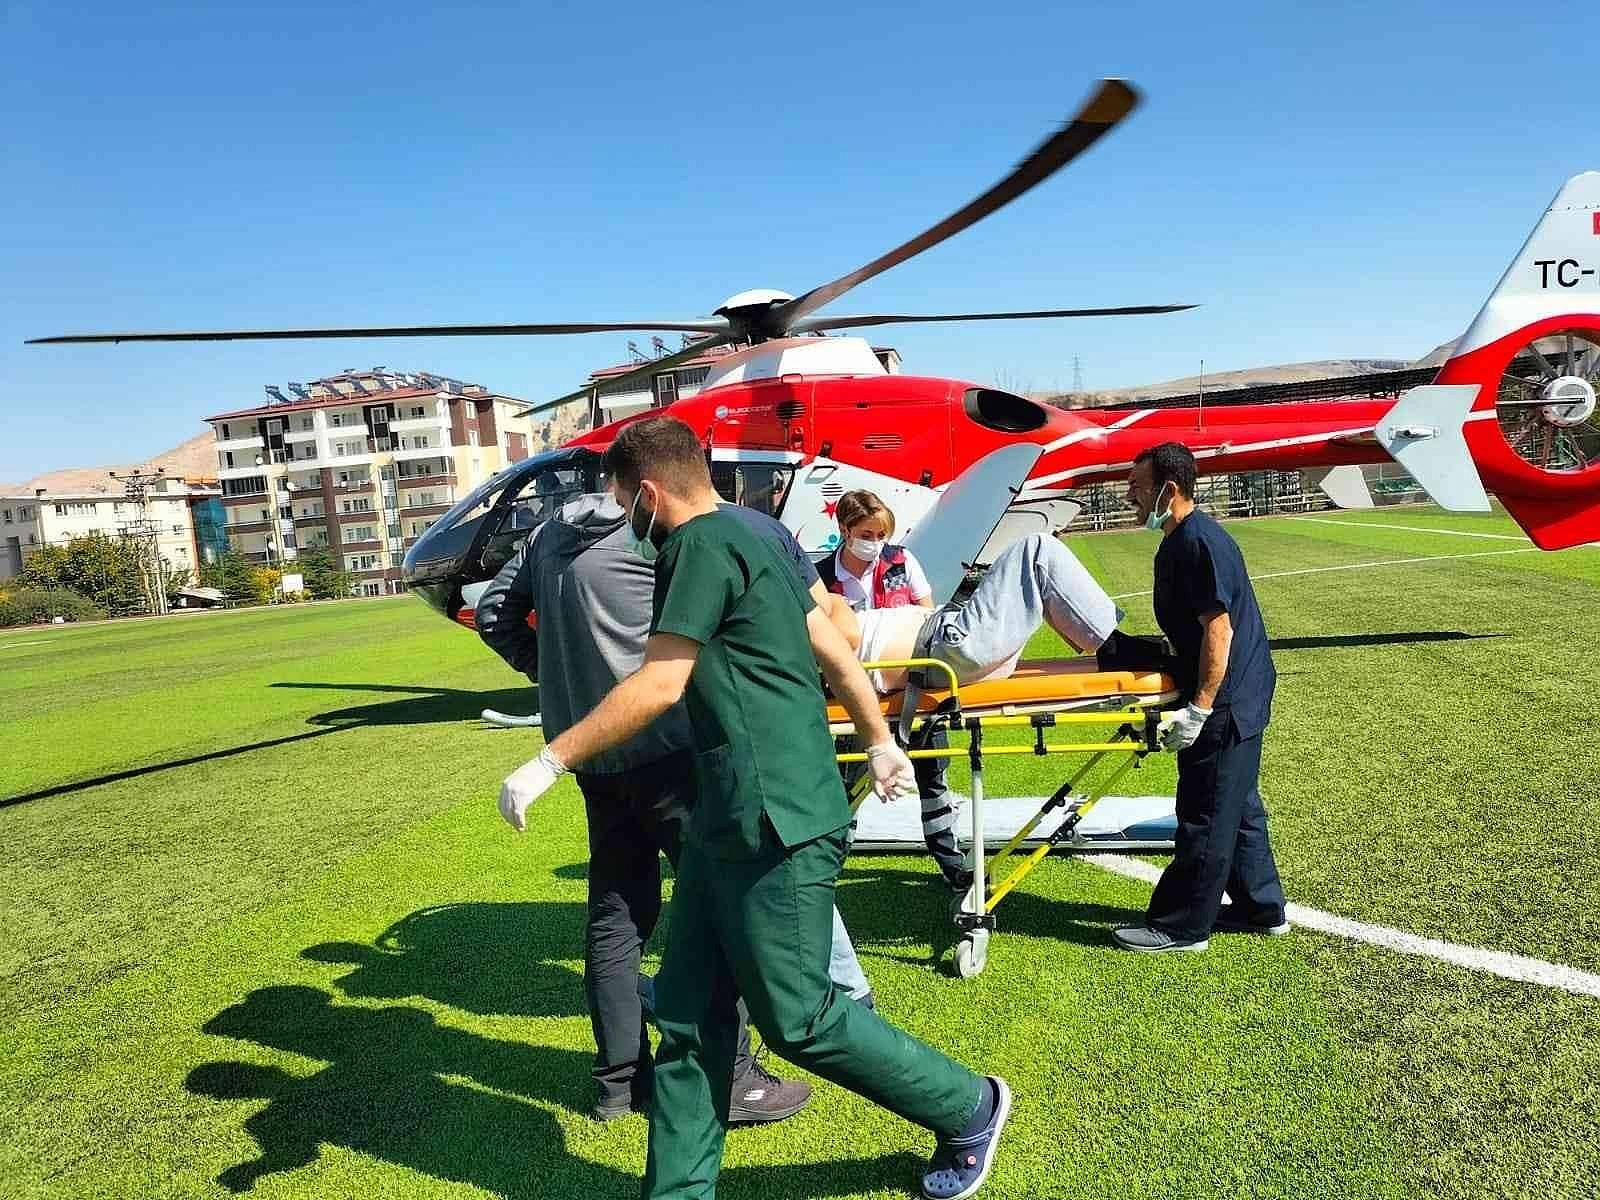 2021/10/ambulans-helikopter-kalp-krizi-geciren-hasta-icin-havalandi-20211012AW43-4.jpg